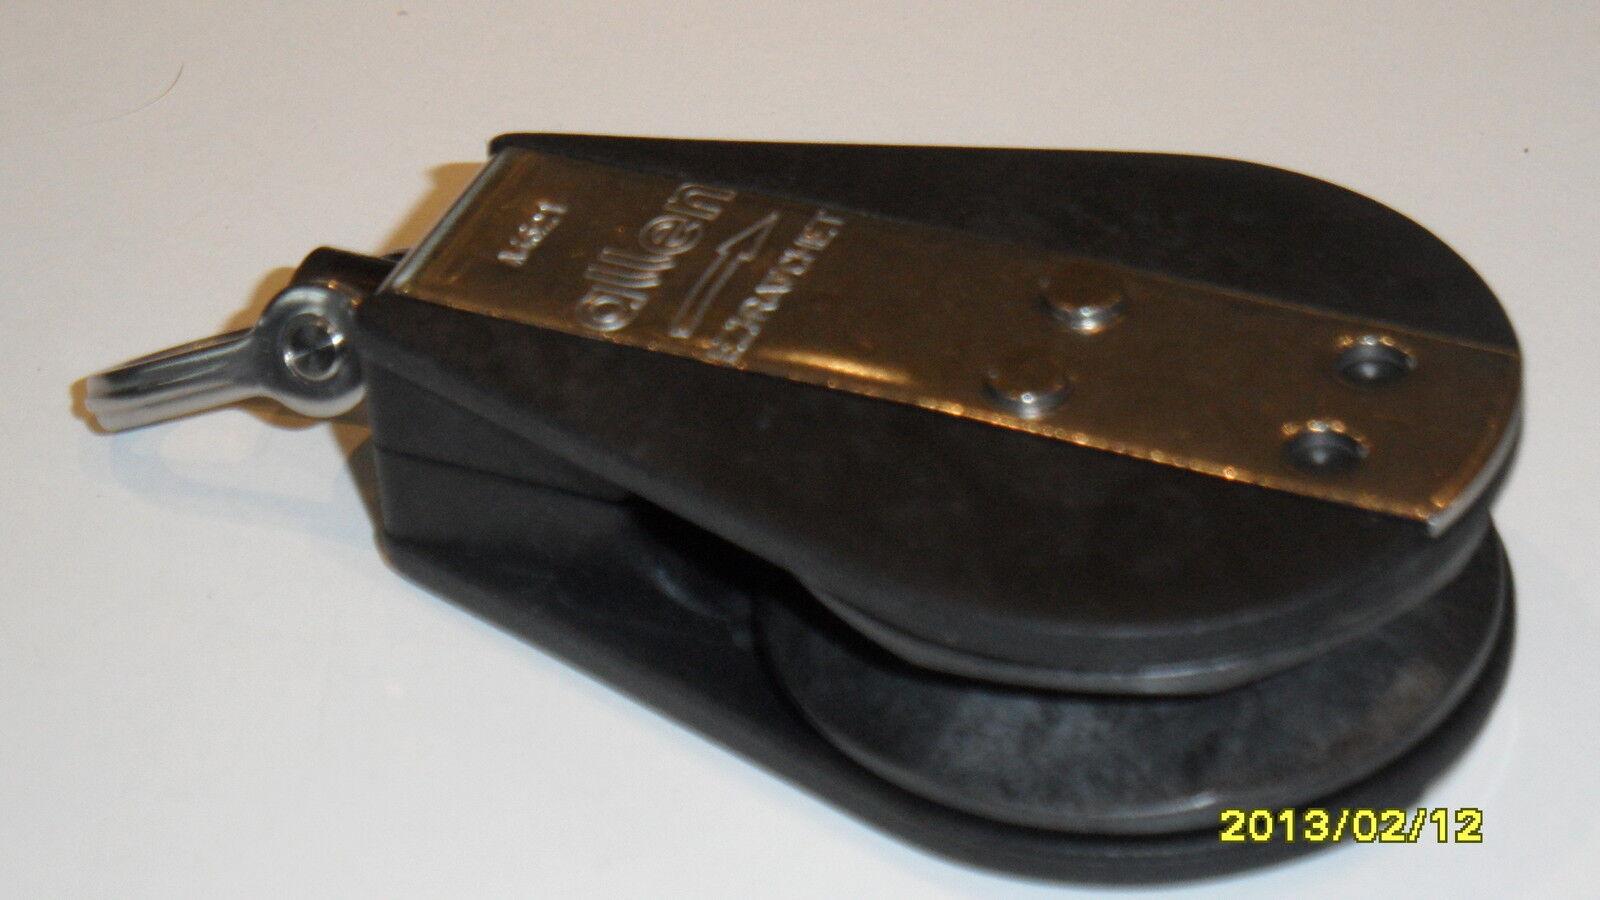 Allen AL4621 52mm Ezi Ratchet & swivel Laser Mirror RS Solo from Lulham-Robinson